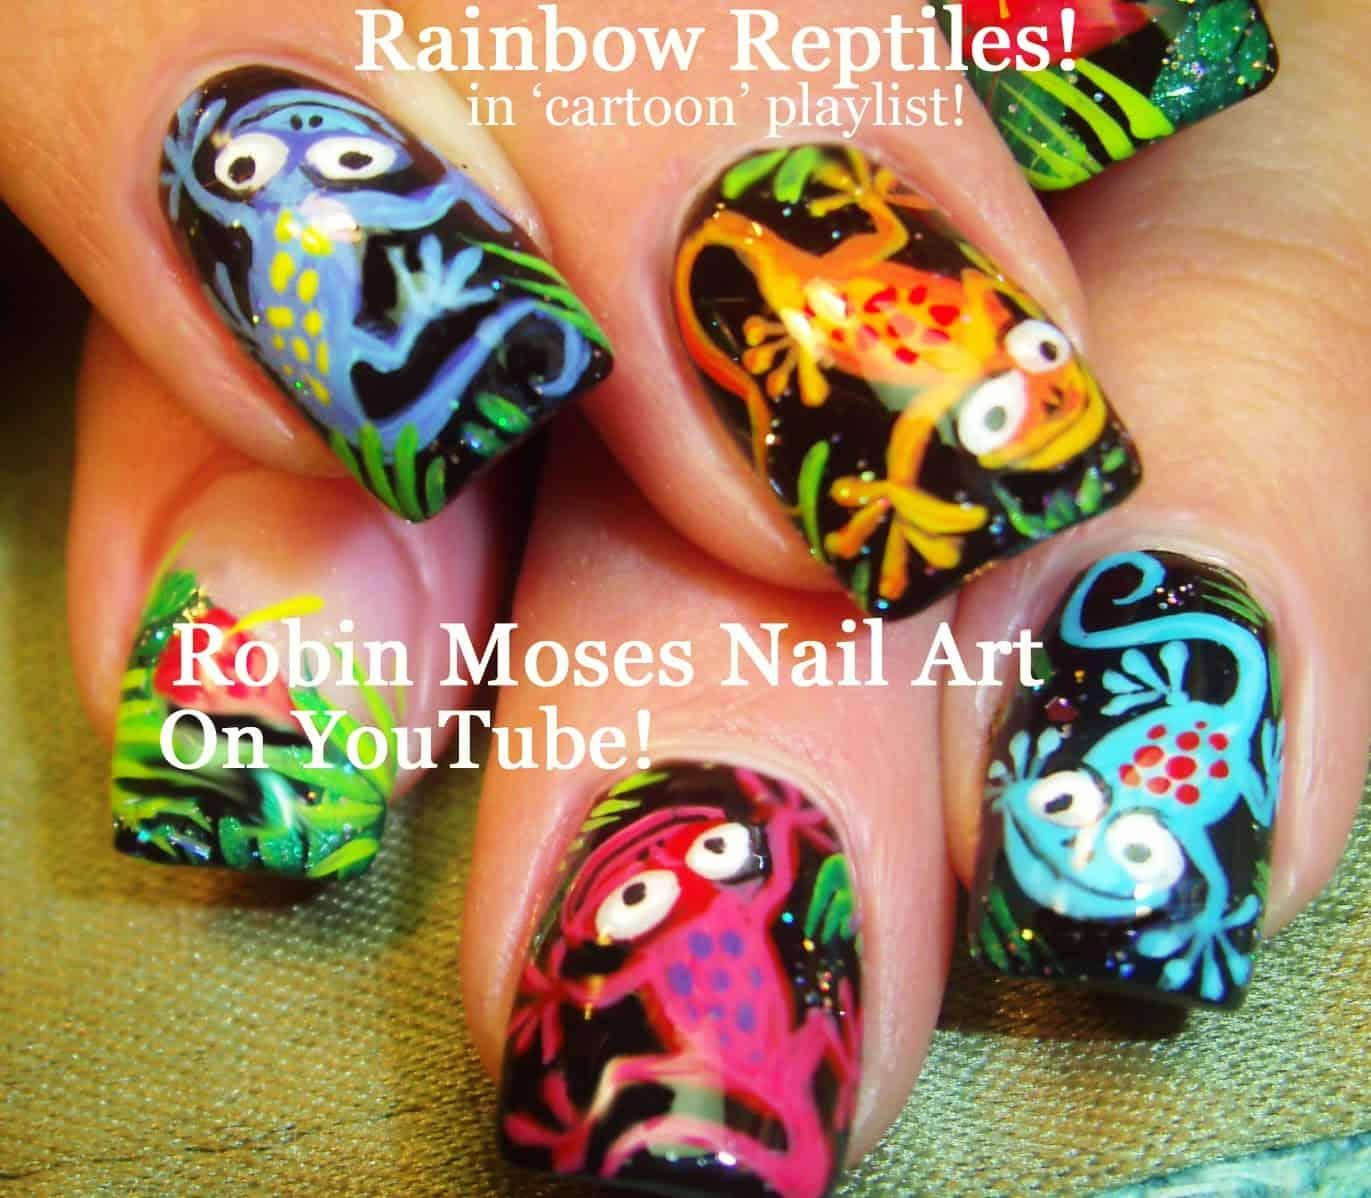 Rainbow reptile manicure